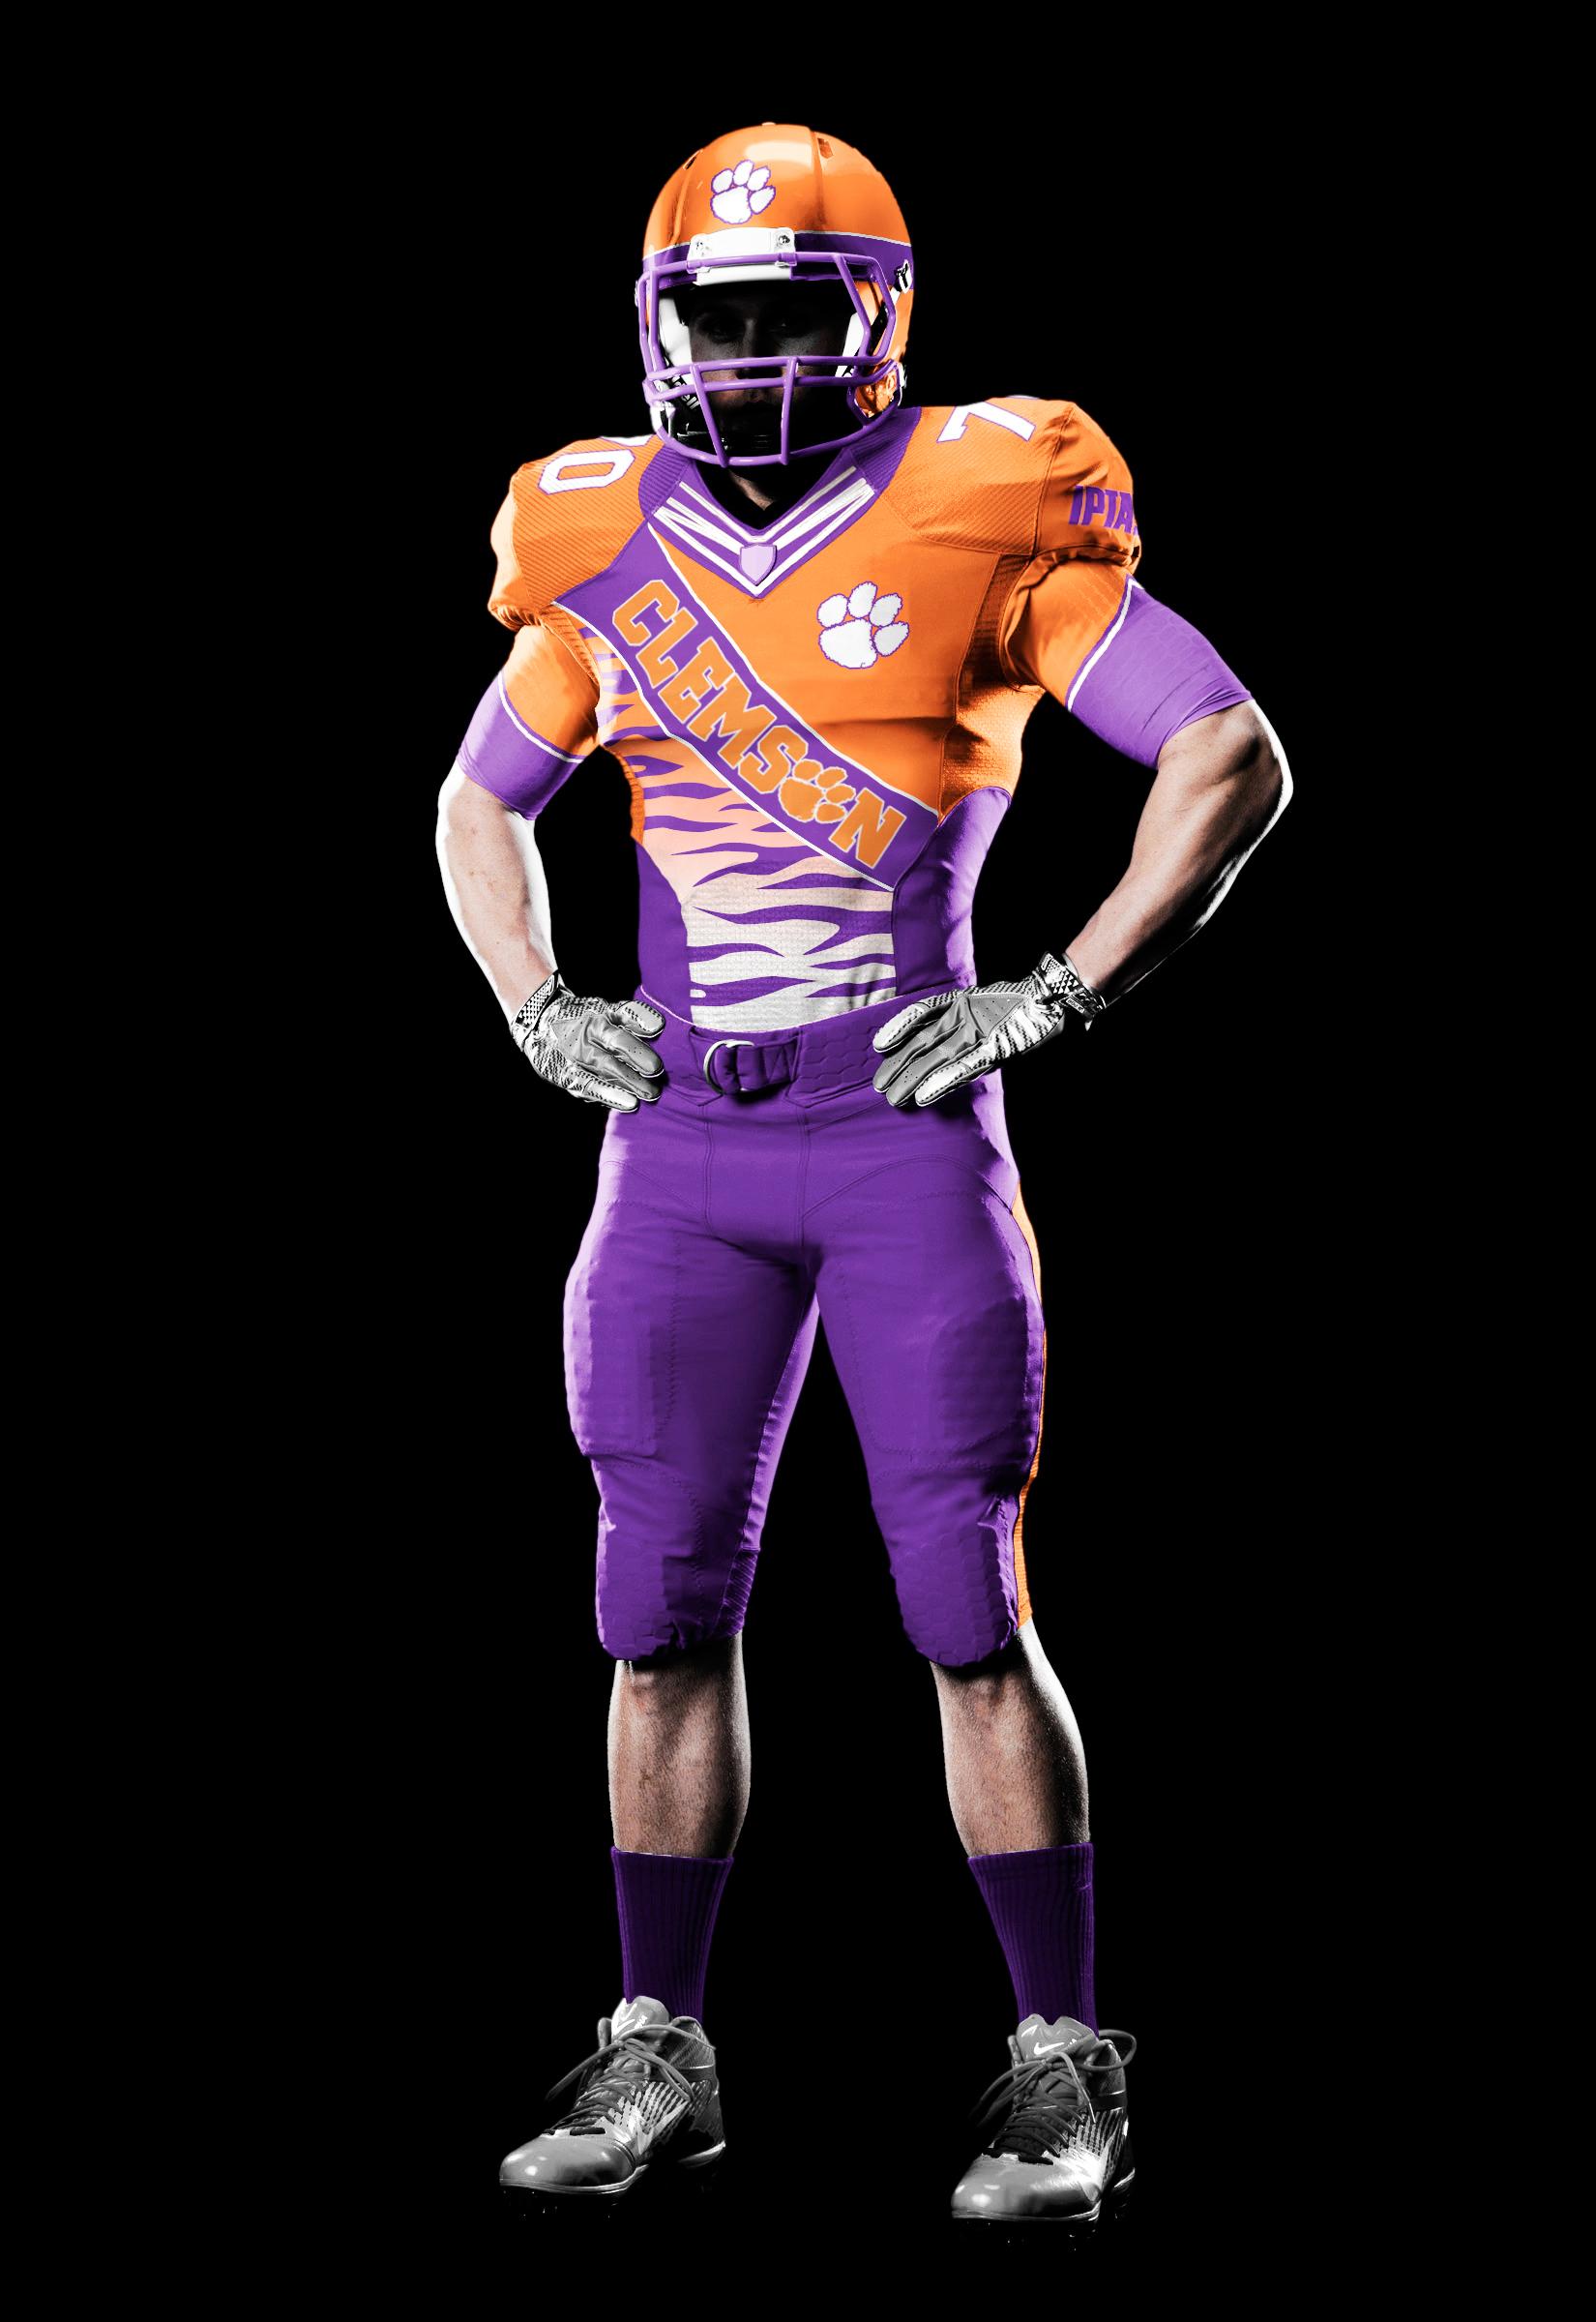 The Ten Craziest Alternate College Football Uniforms Based